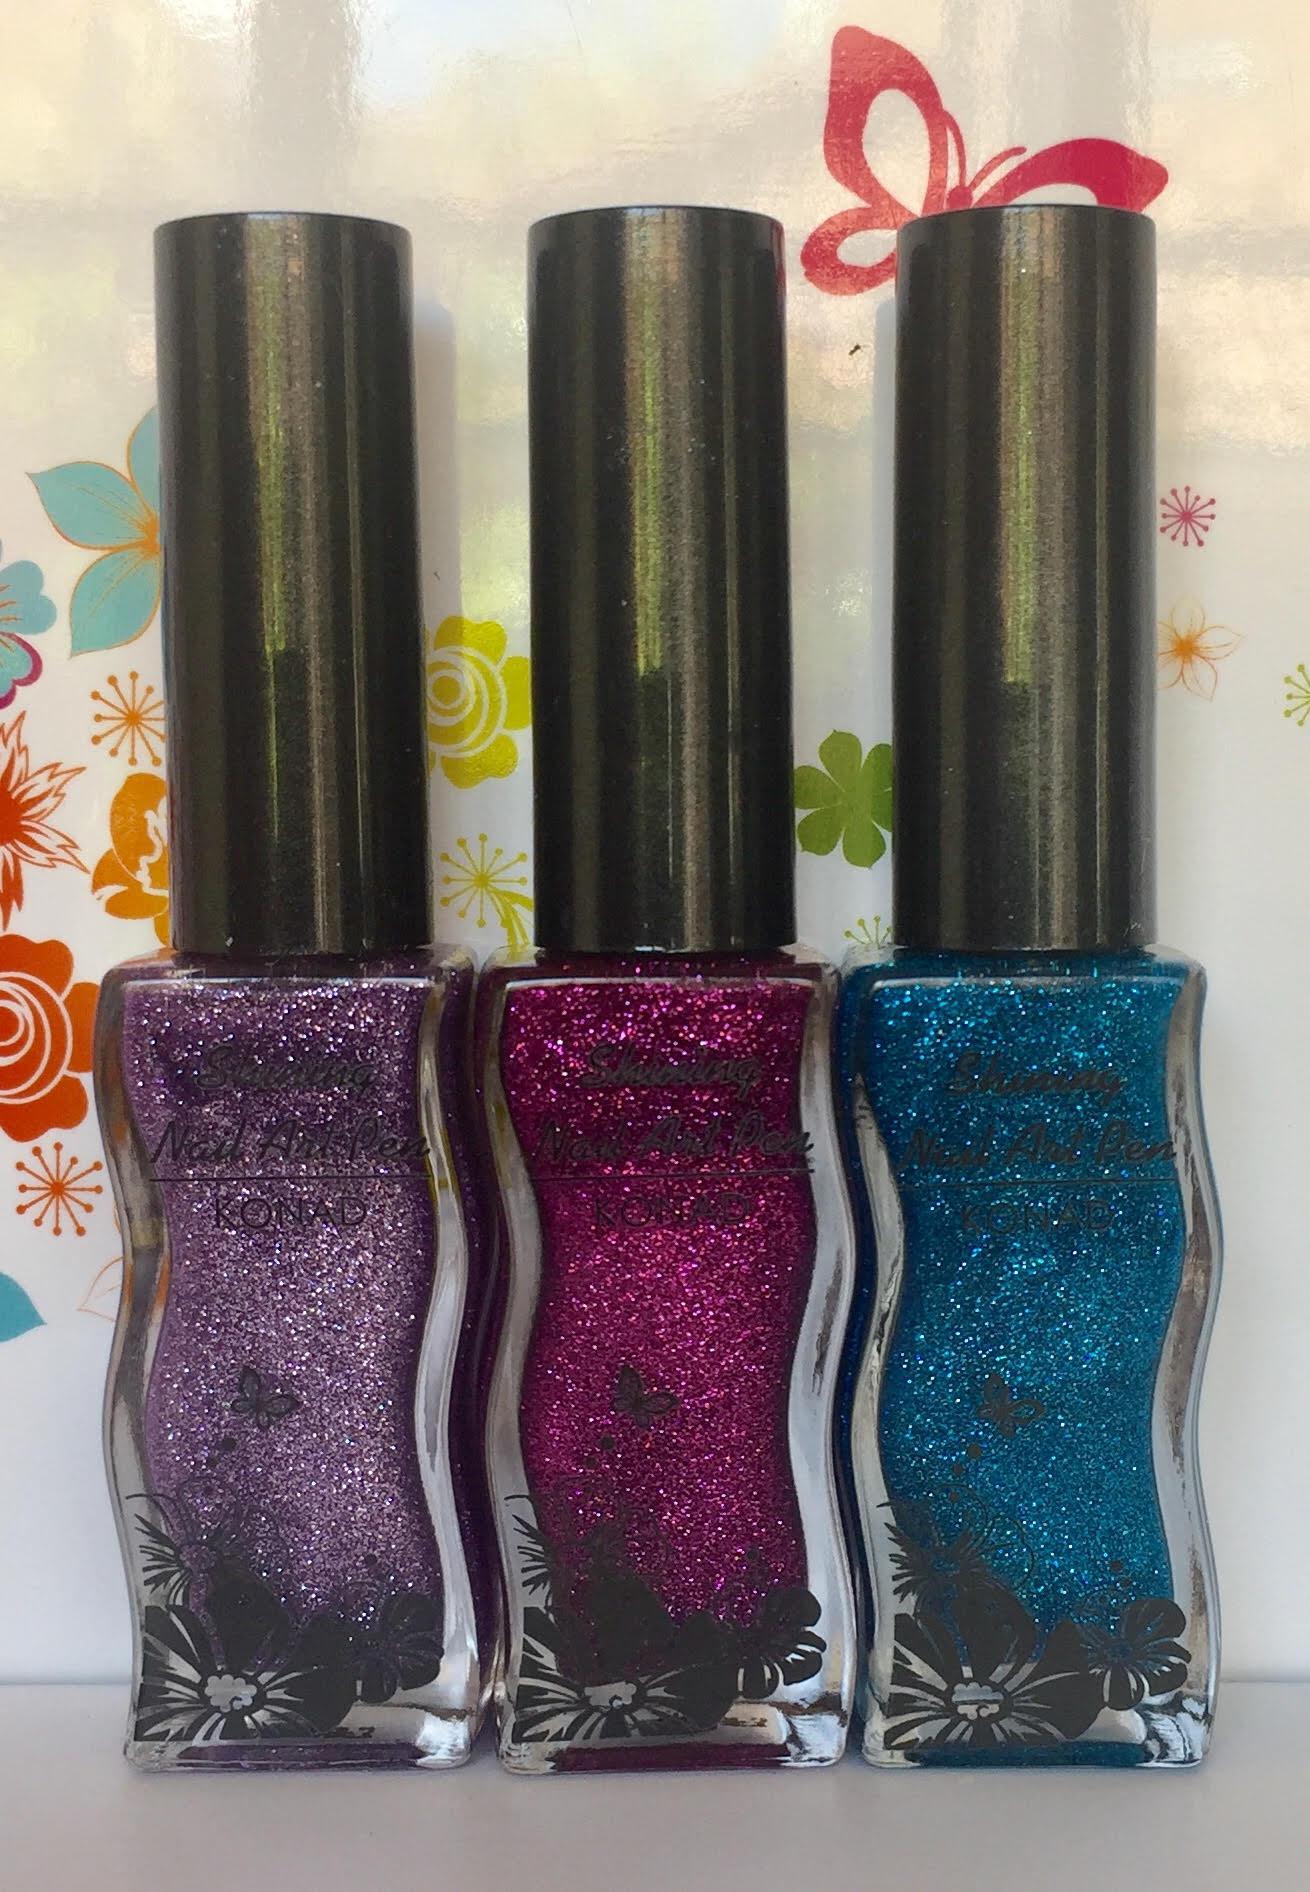 Set 3 Shining Nail Art Pen Konad